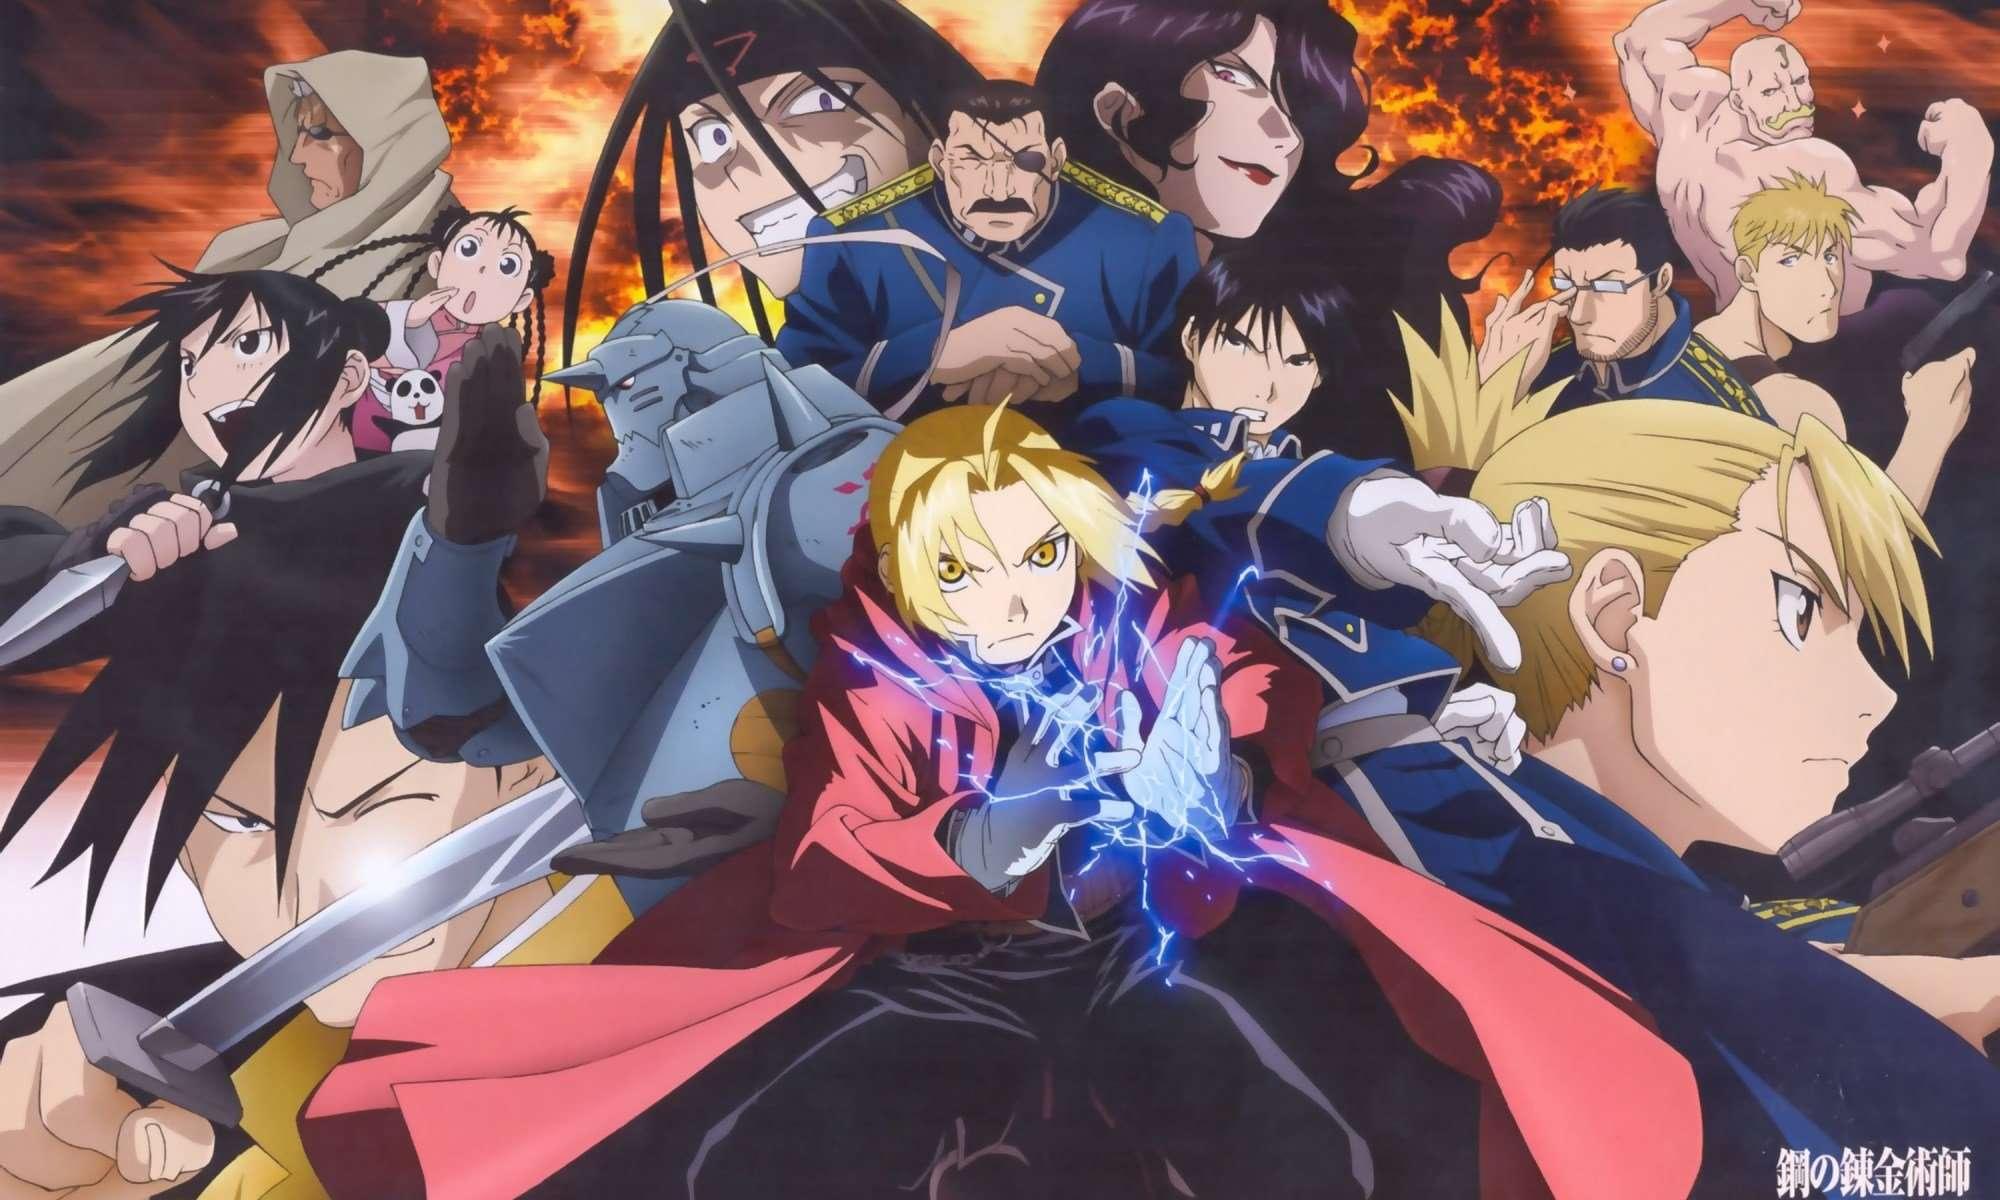 Fullmetal Alchemist Brotherhood by Studio Bones